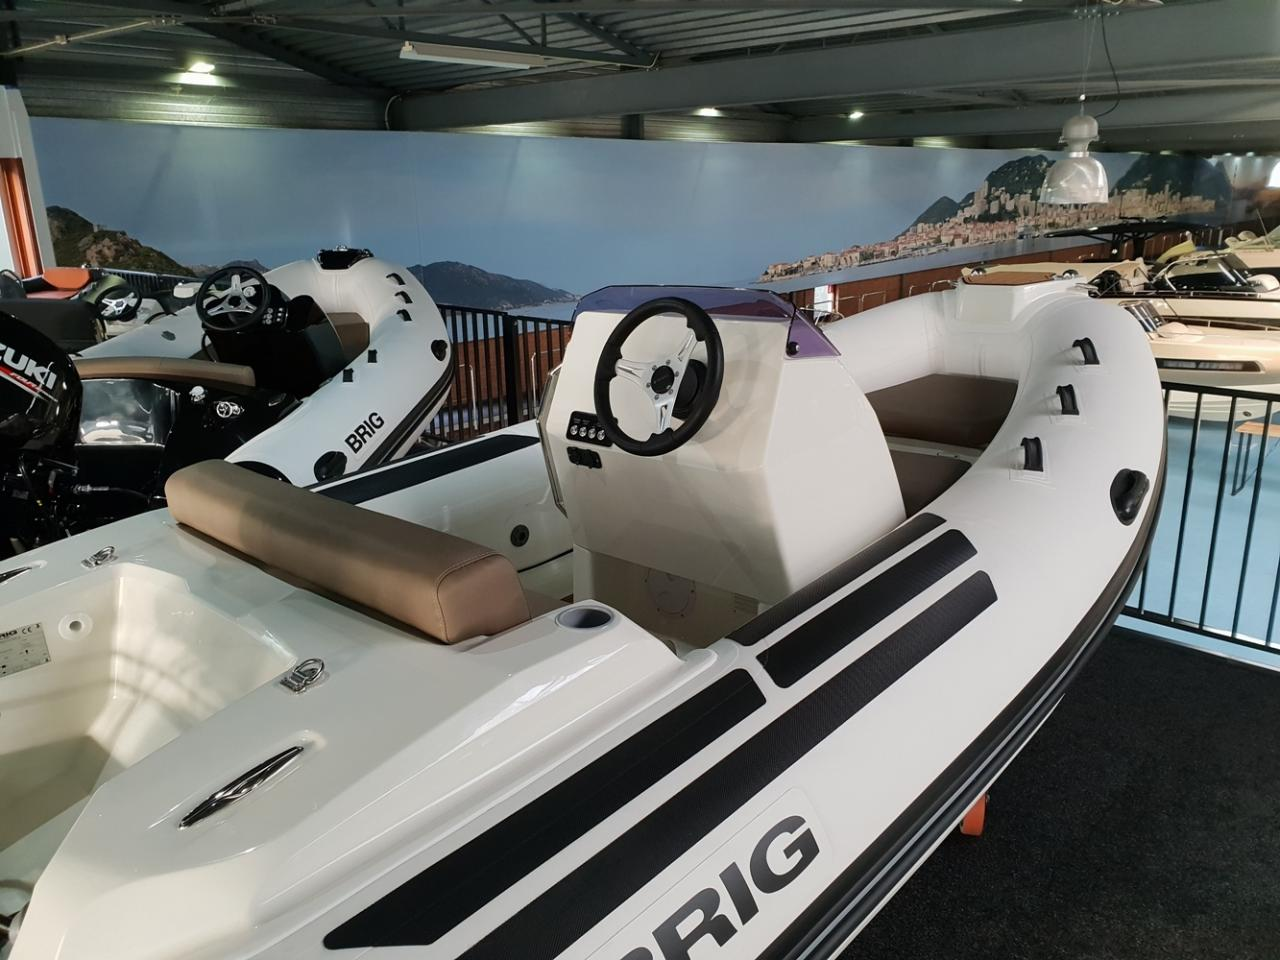 Brig Eagle 4 met Suzuki 60 pk 3